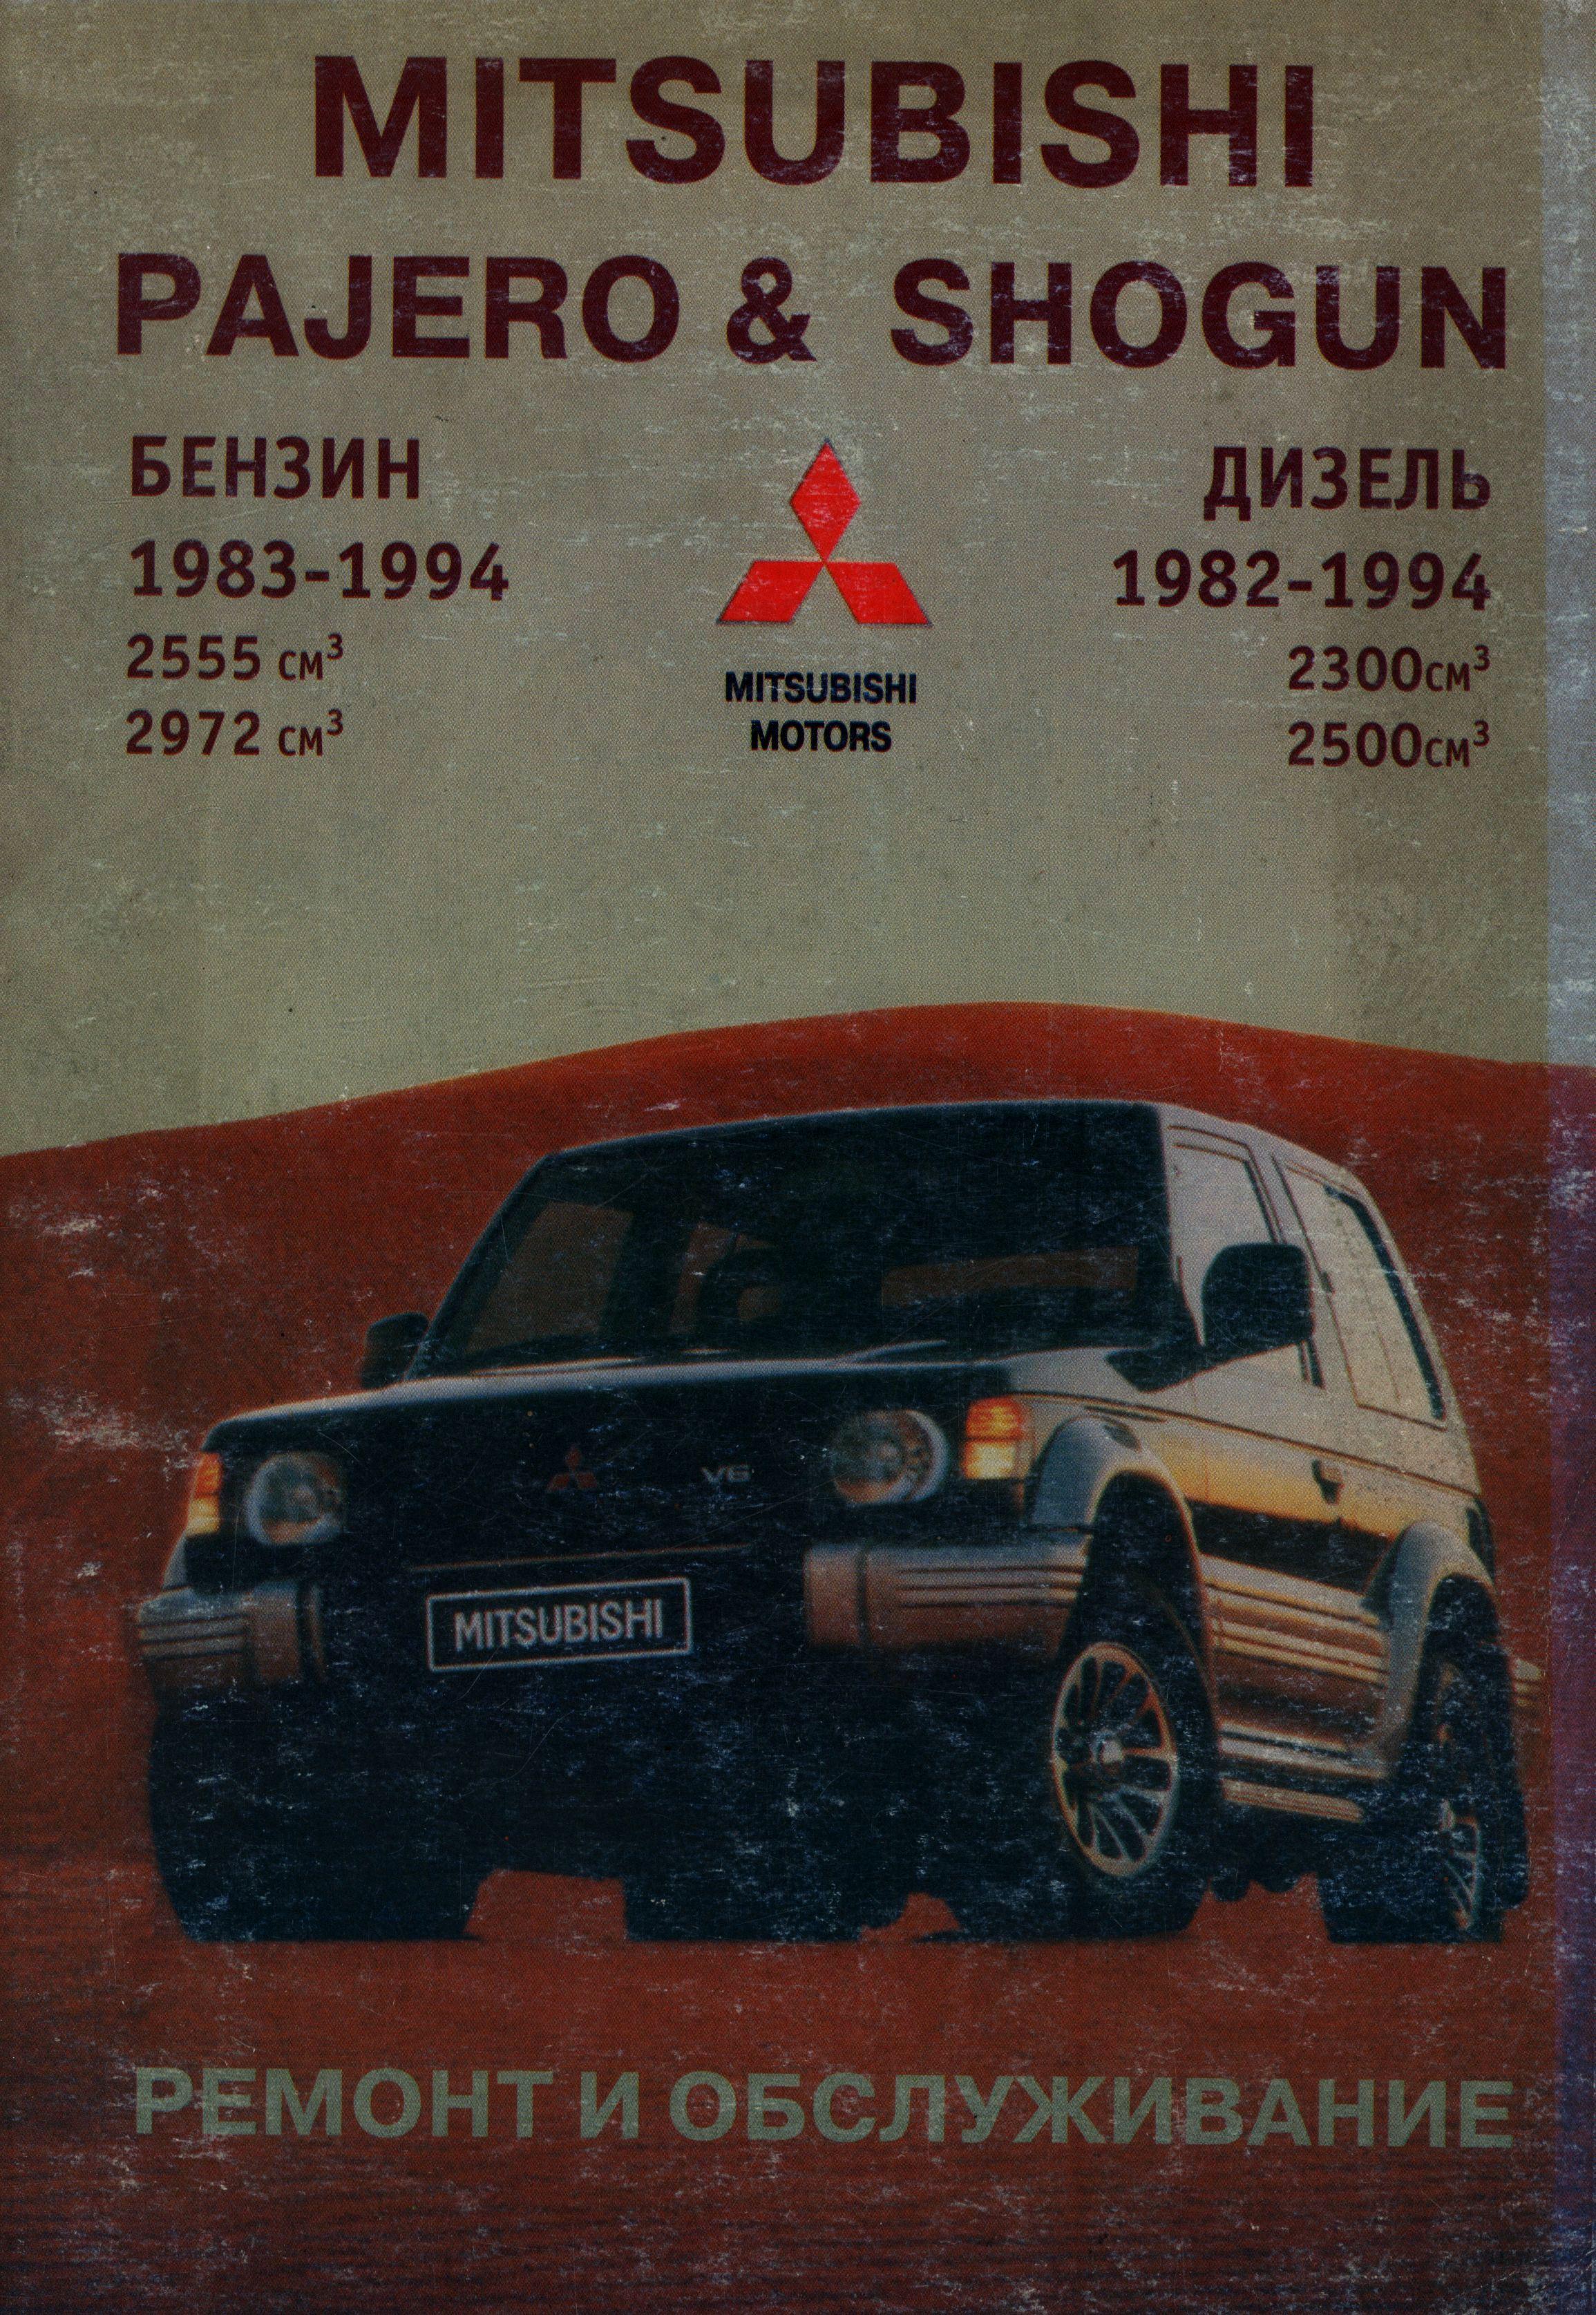 MITSUBISHI PAJERO 1982-1994 бензин/дизель Книга по ремонту и техническому обслуживанию